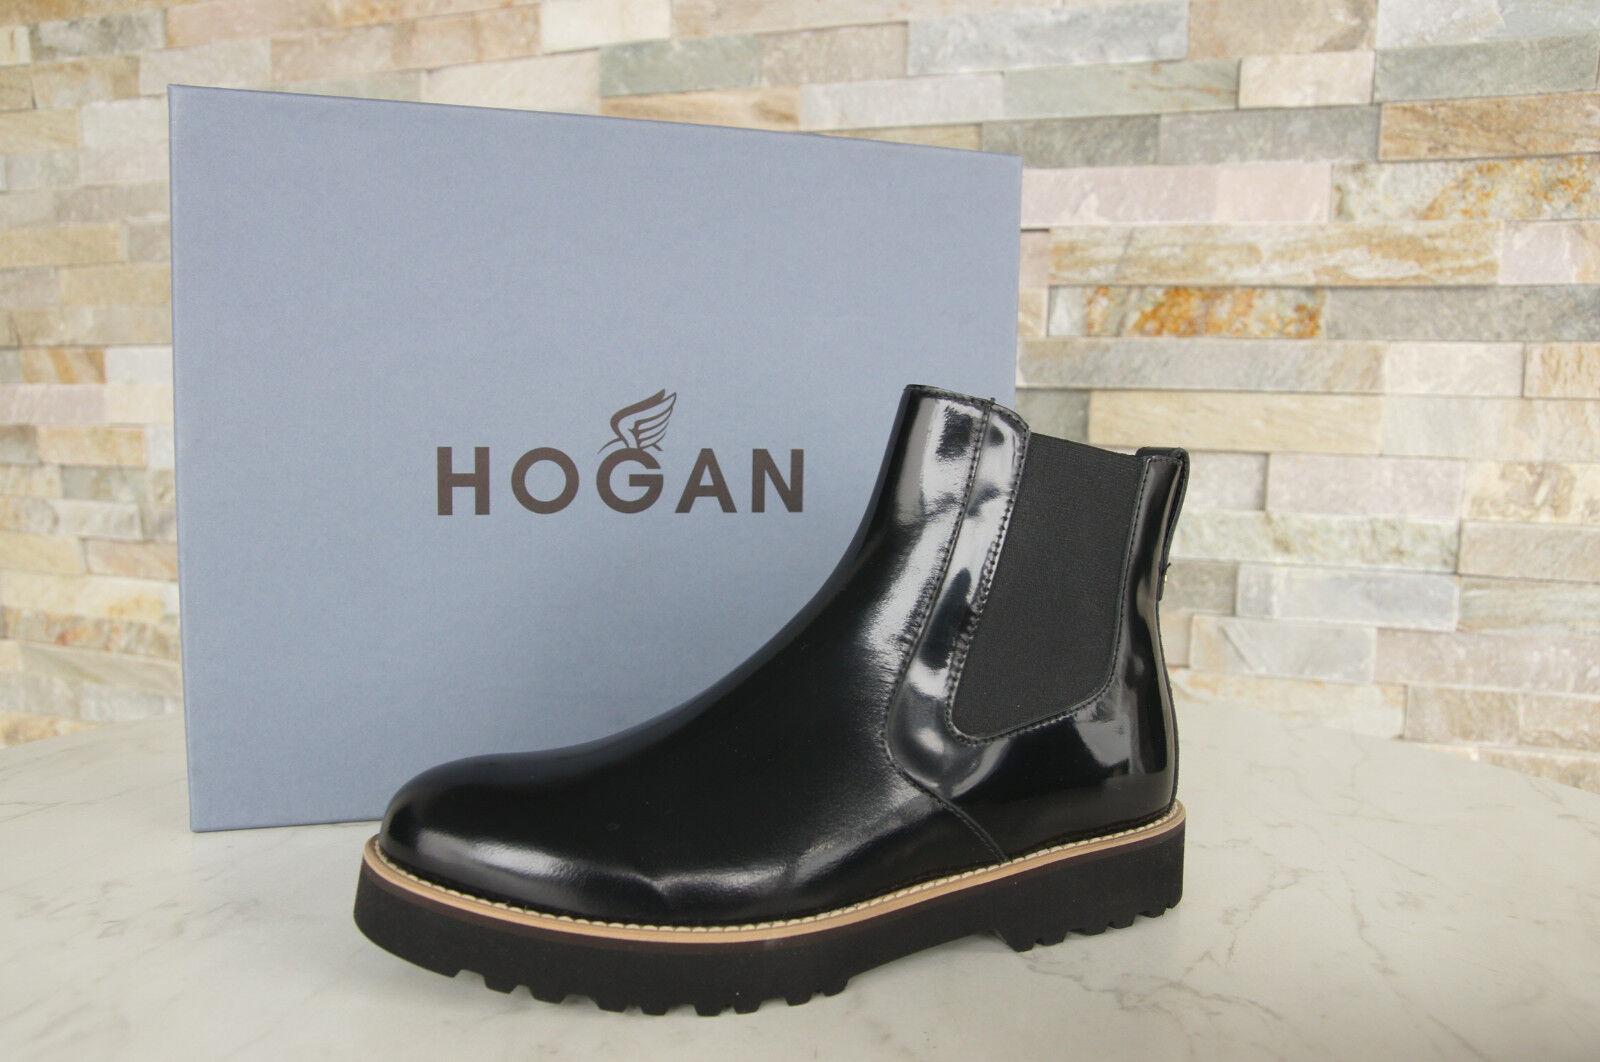 Hogan tods talla 36 botines botaies chelsea chelsea chelsea zapatos negro nuevo ex PVP  solo cómpralo